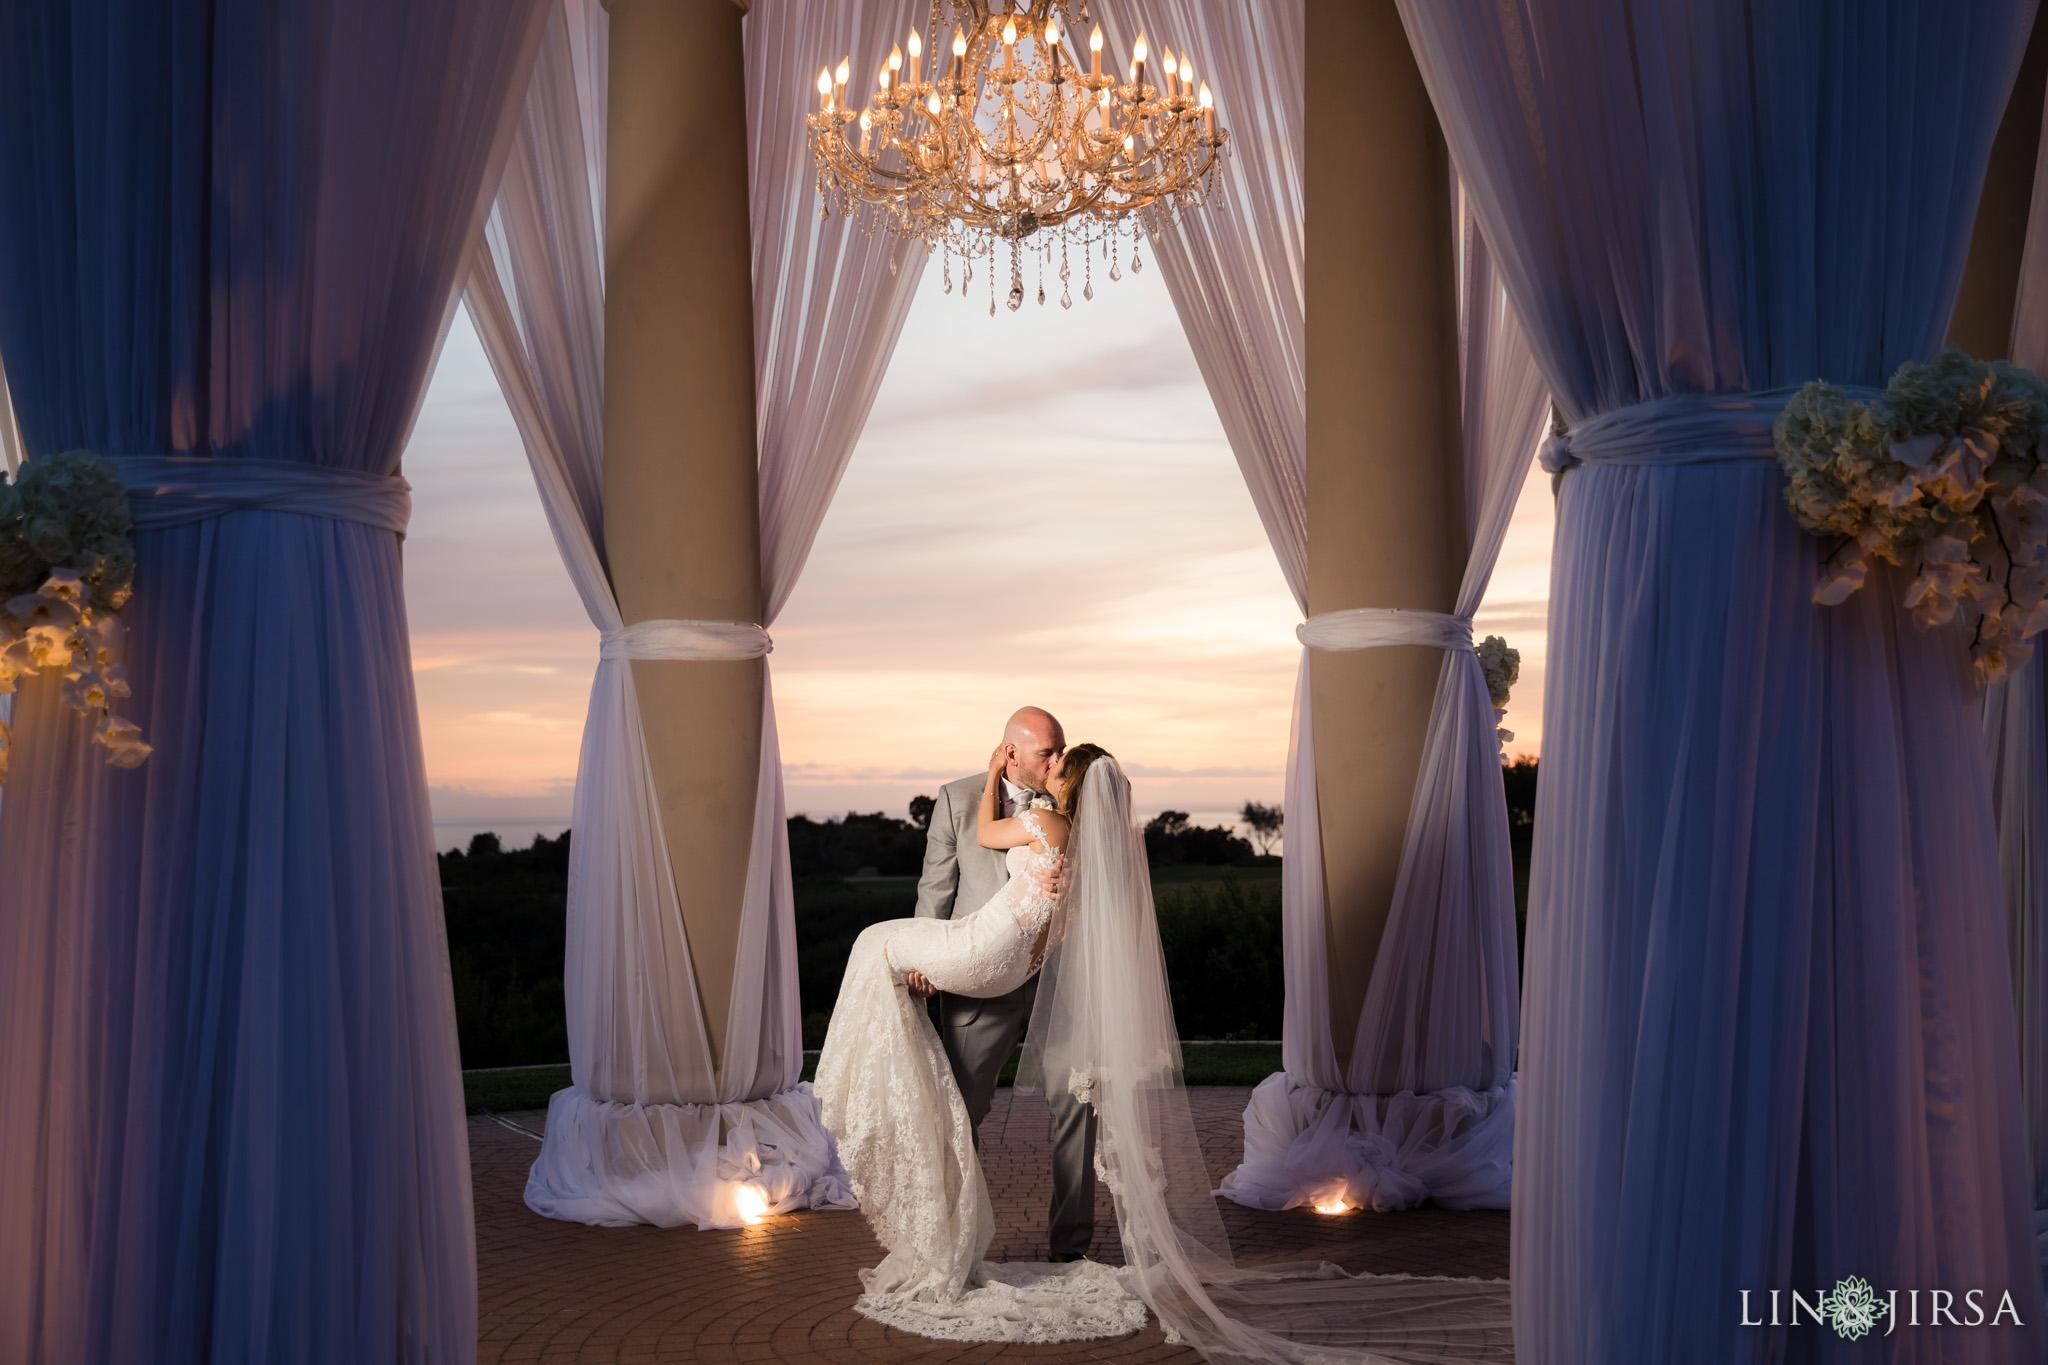 002 pelican hill resort orange county wedding photography